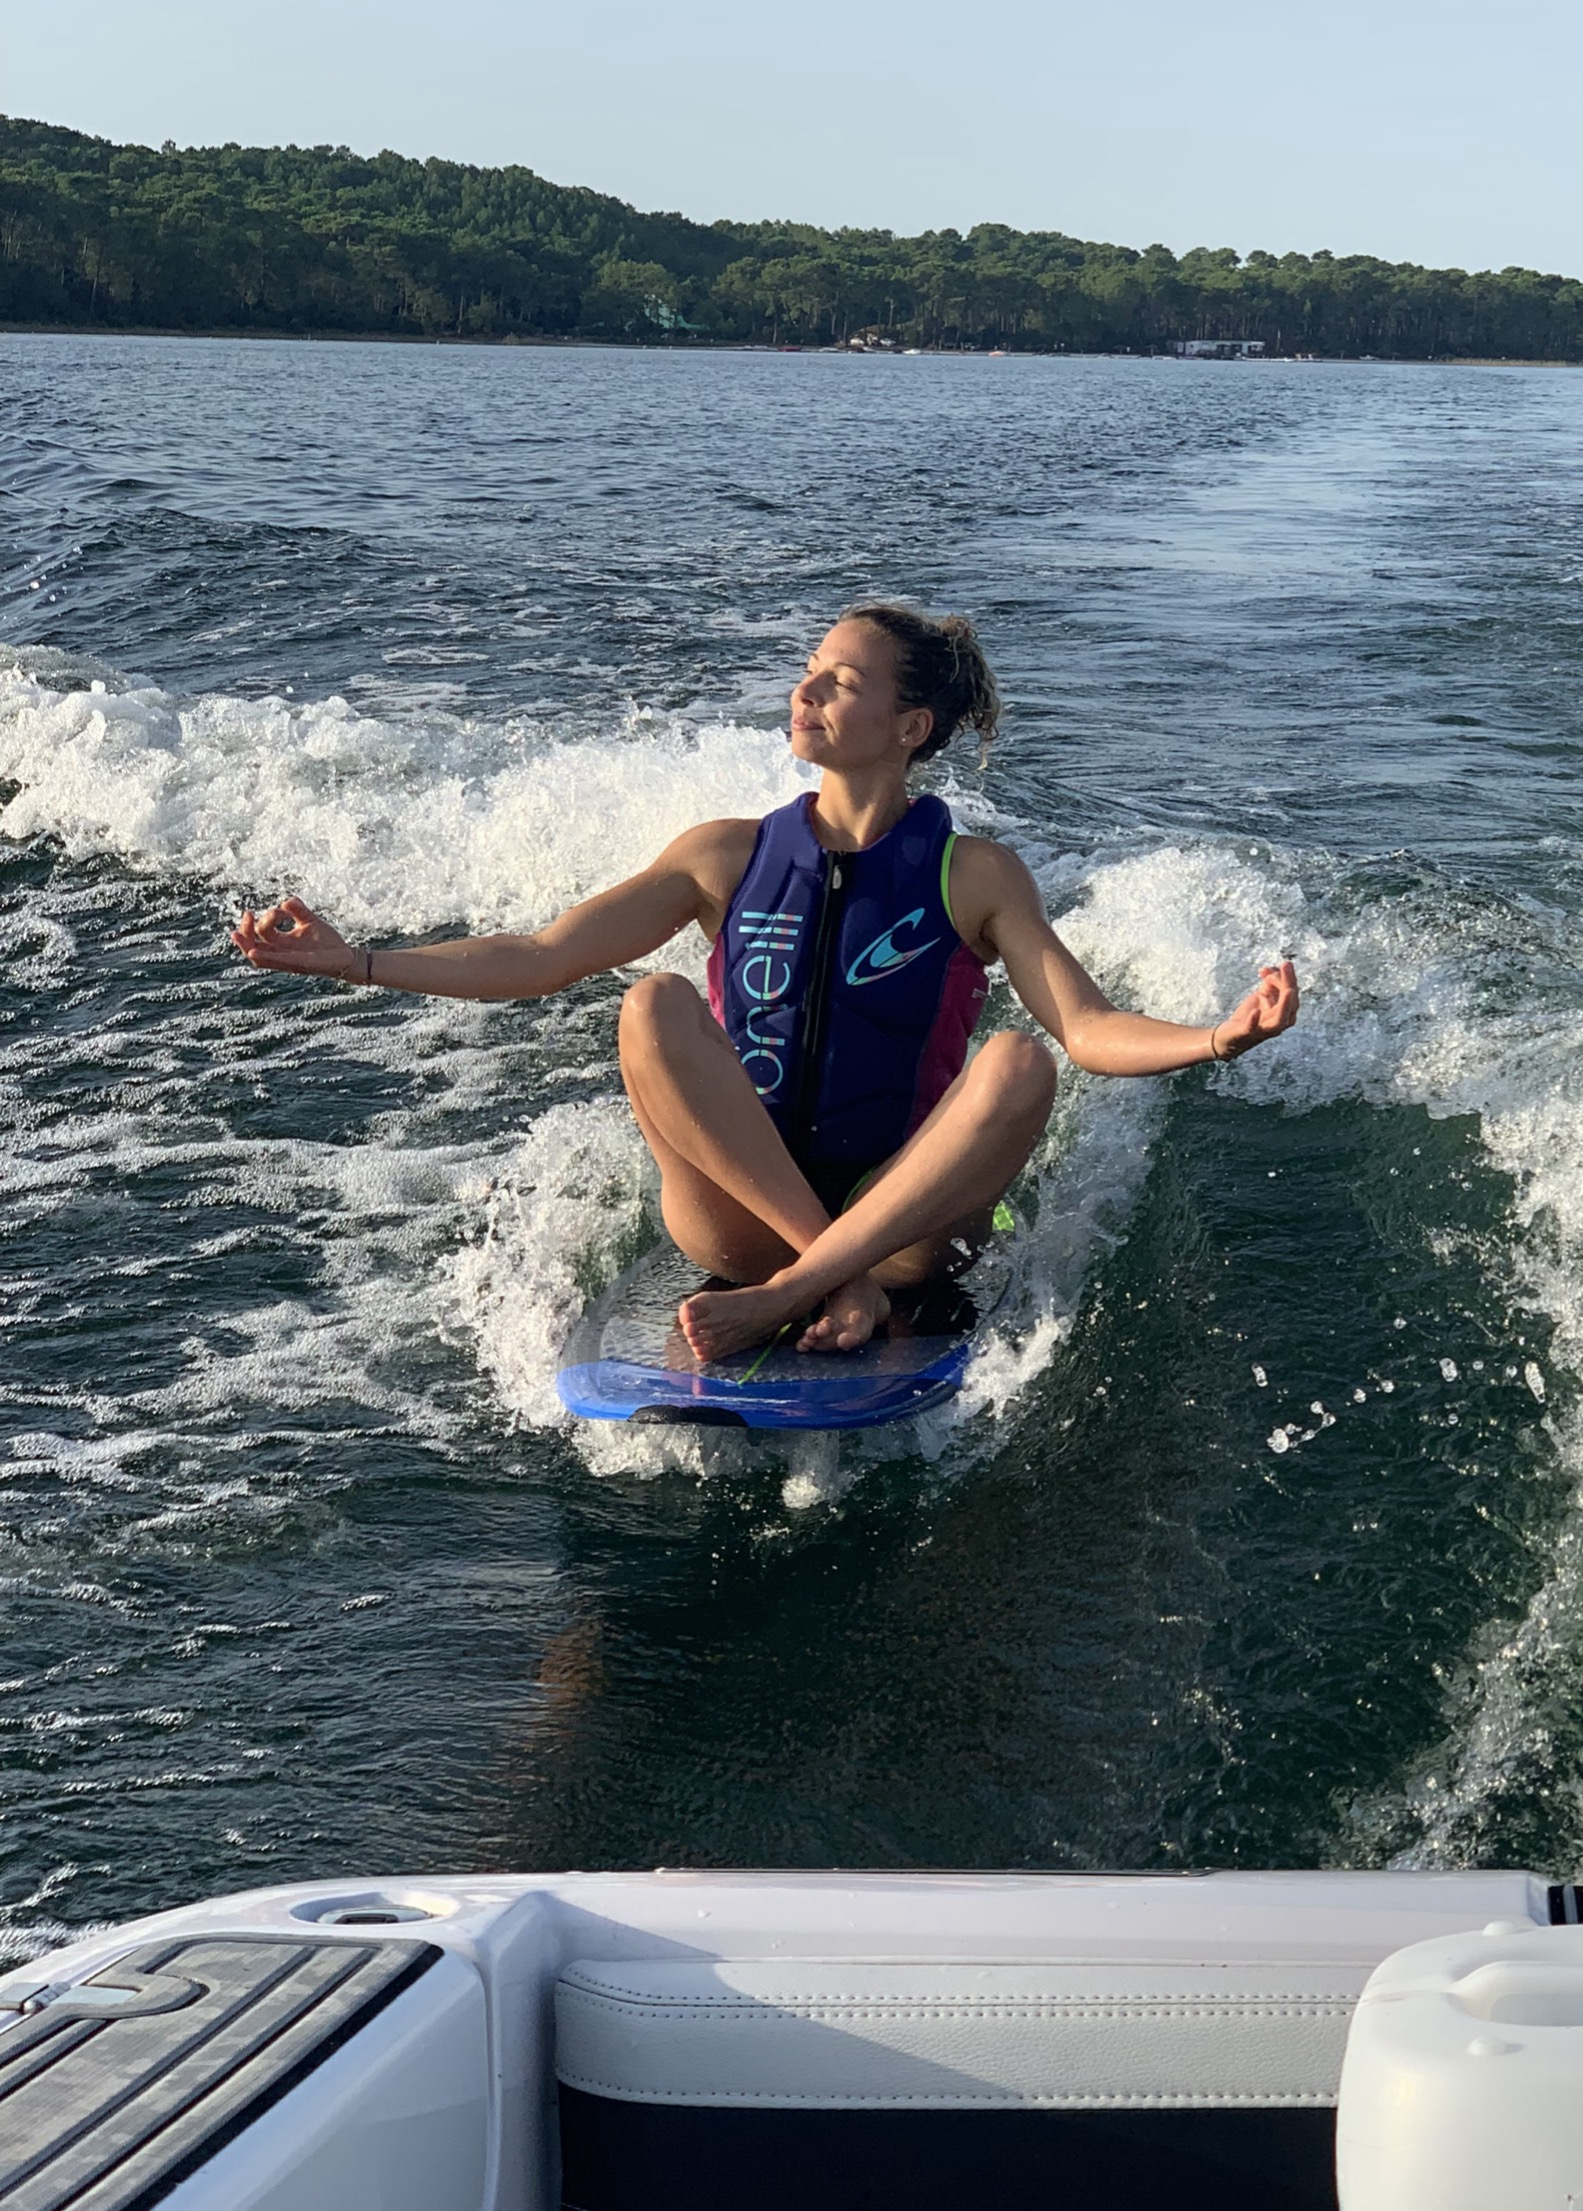 Wakesurf Fun